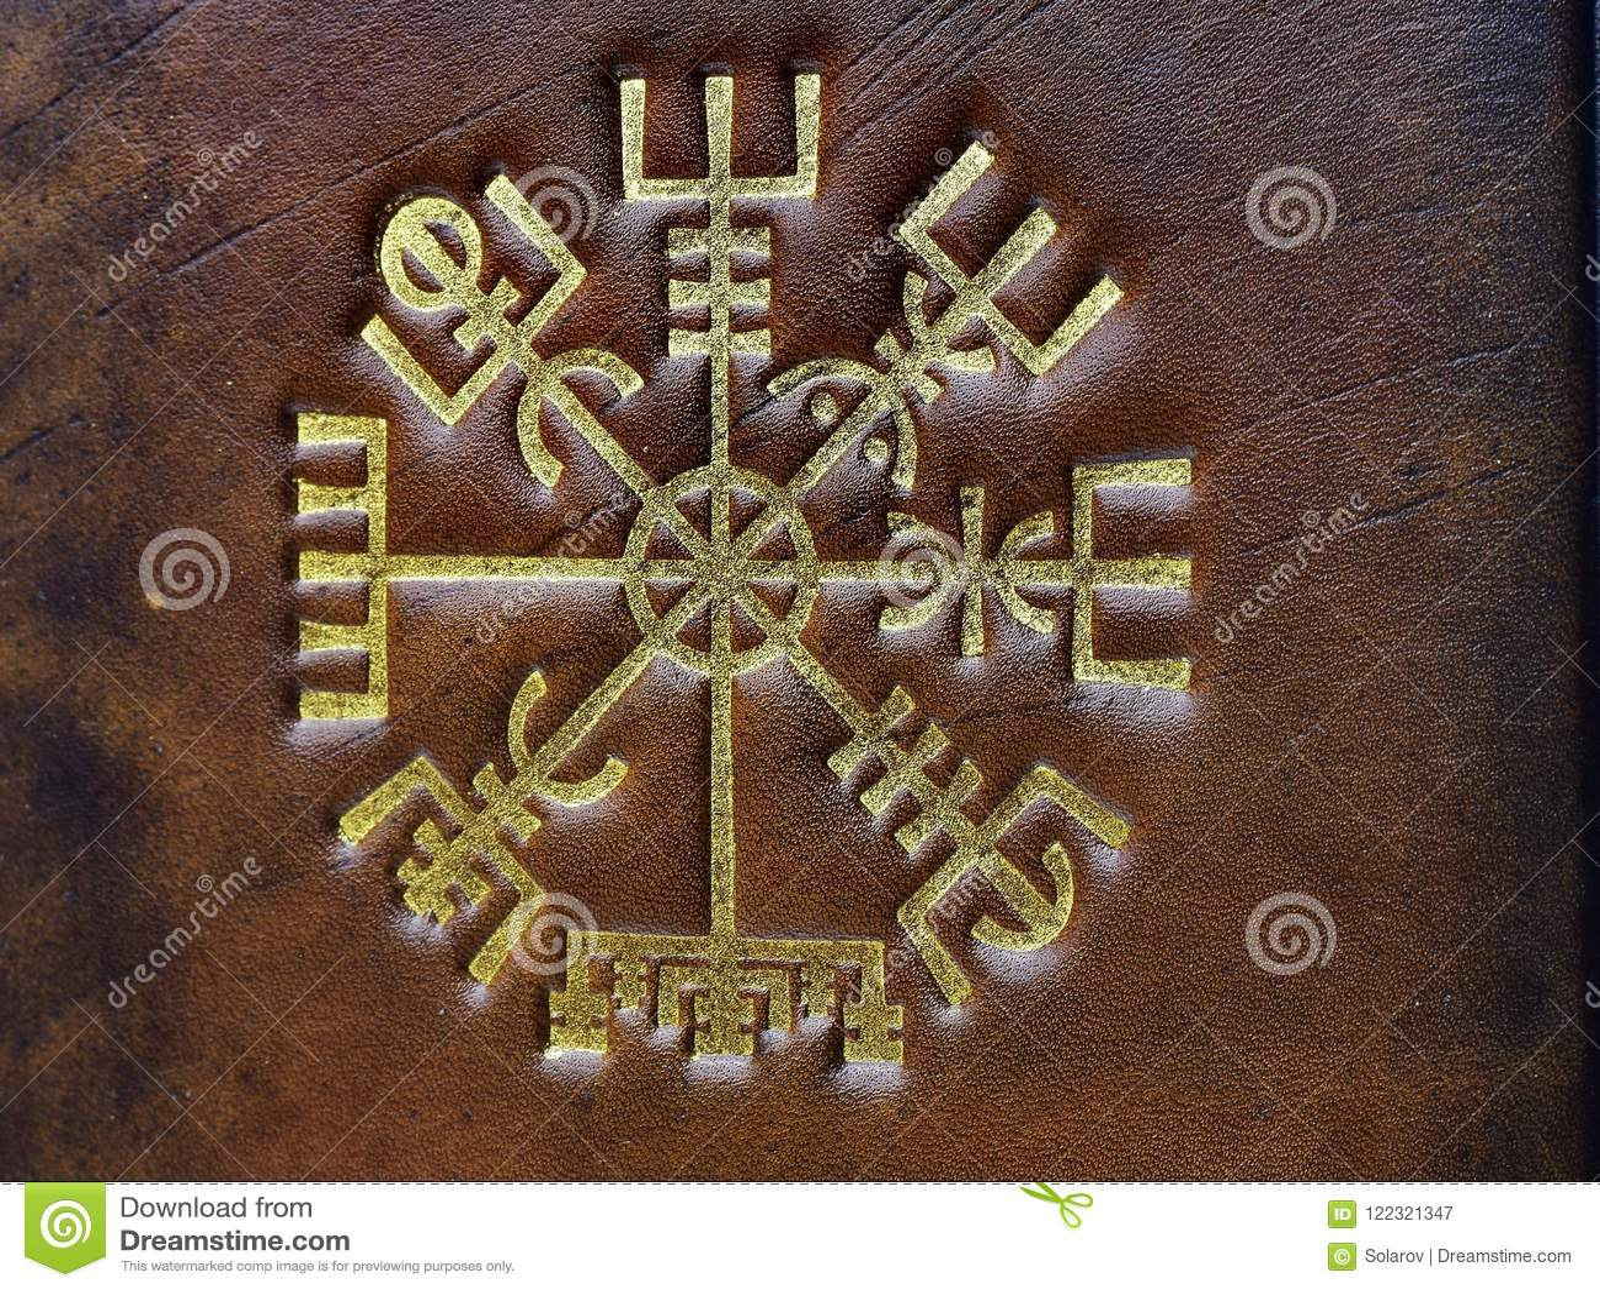 The Vegvisir Ancient Icelandic Magical Symbol Stock Image Image